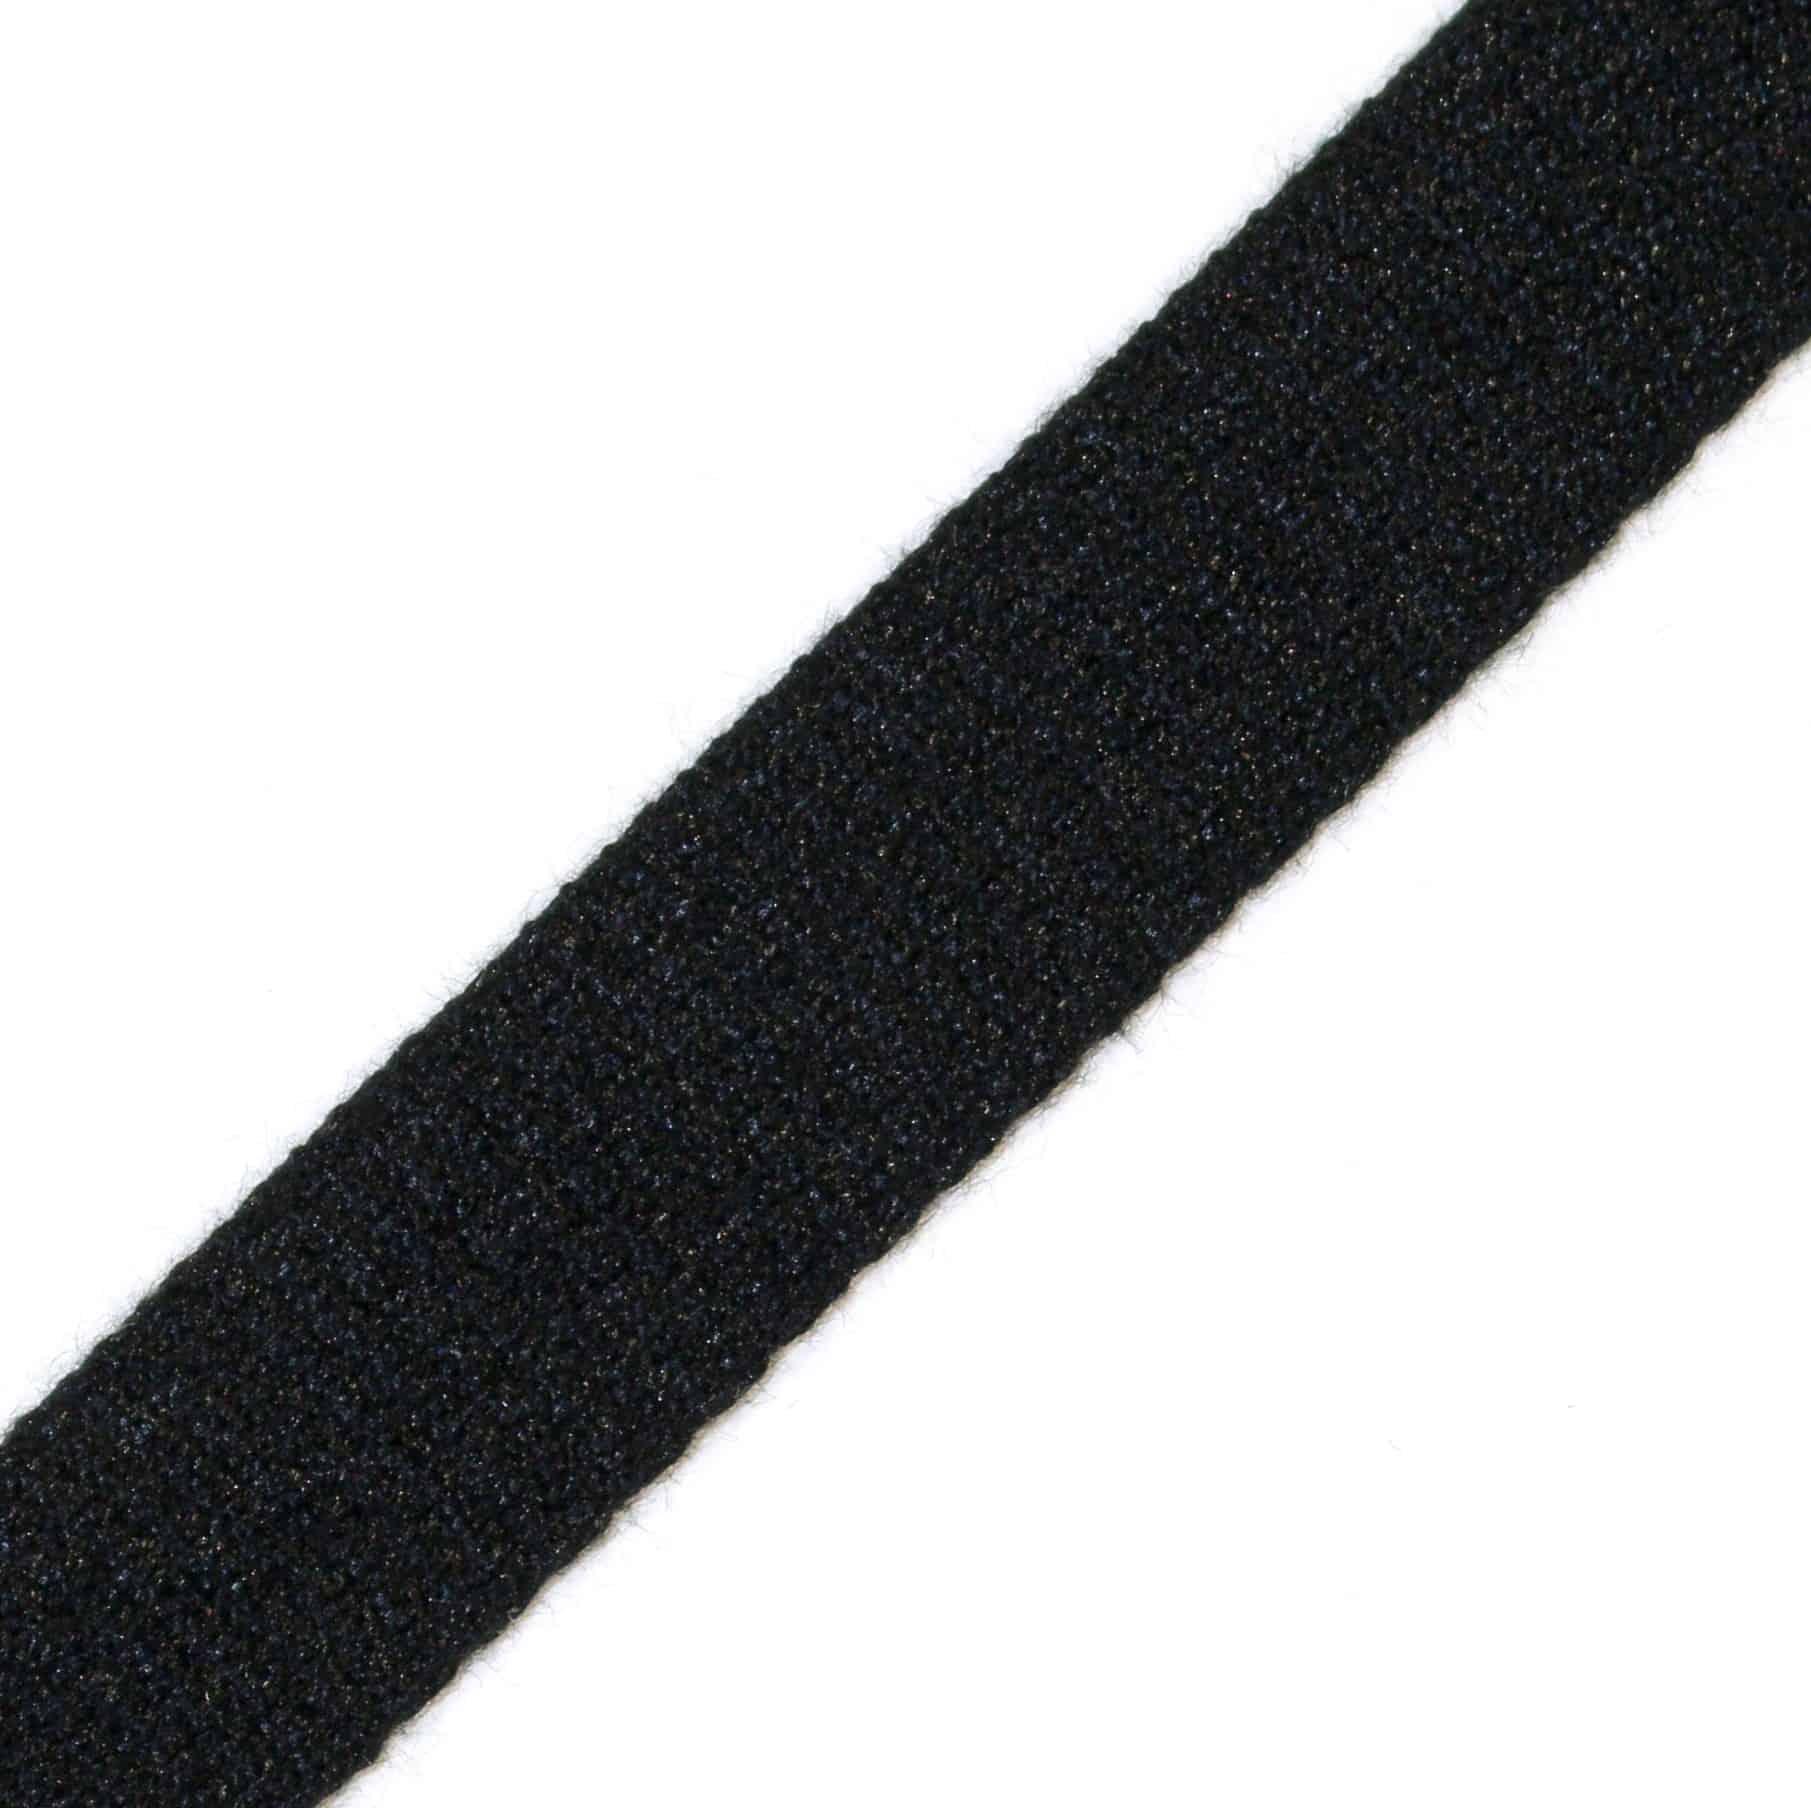 3/4″ Black Nomex® Webbing